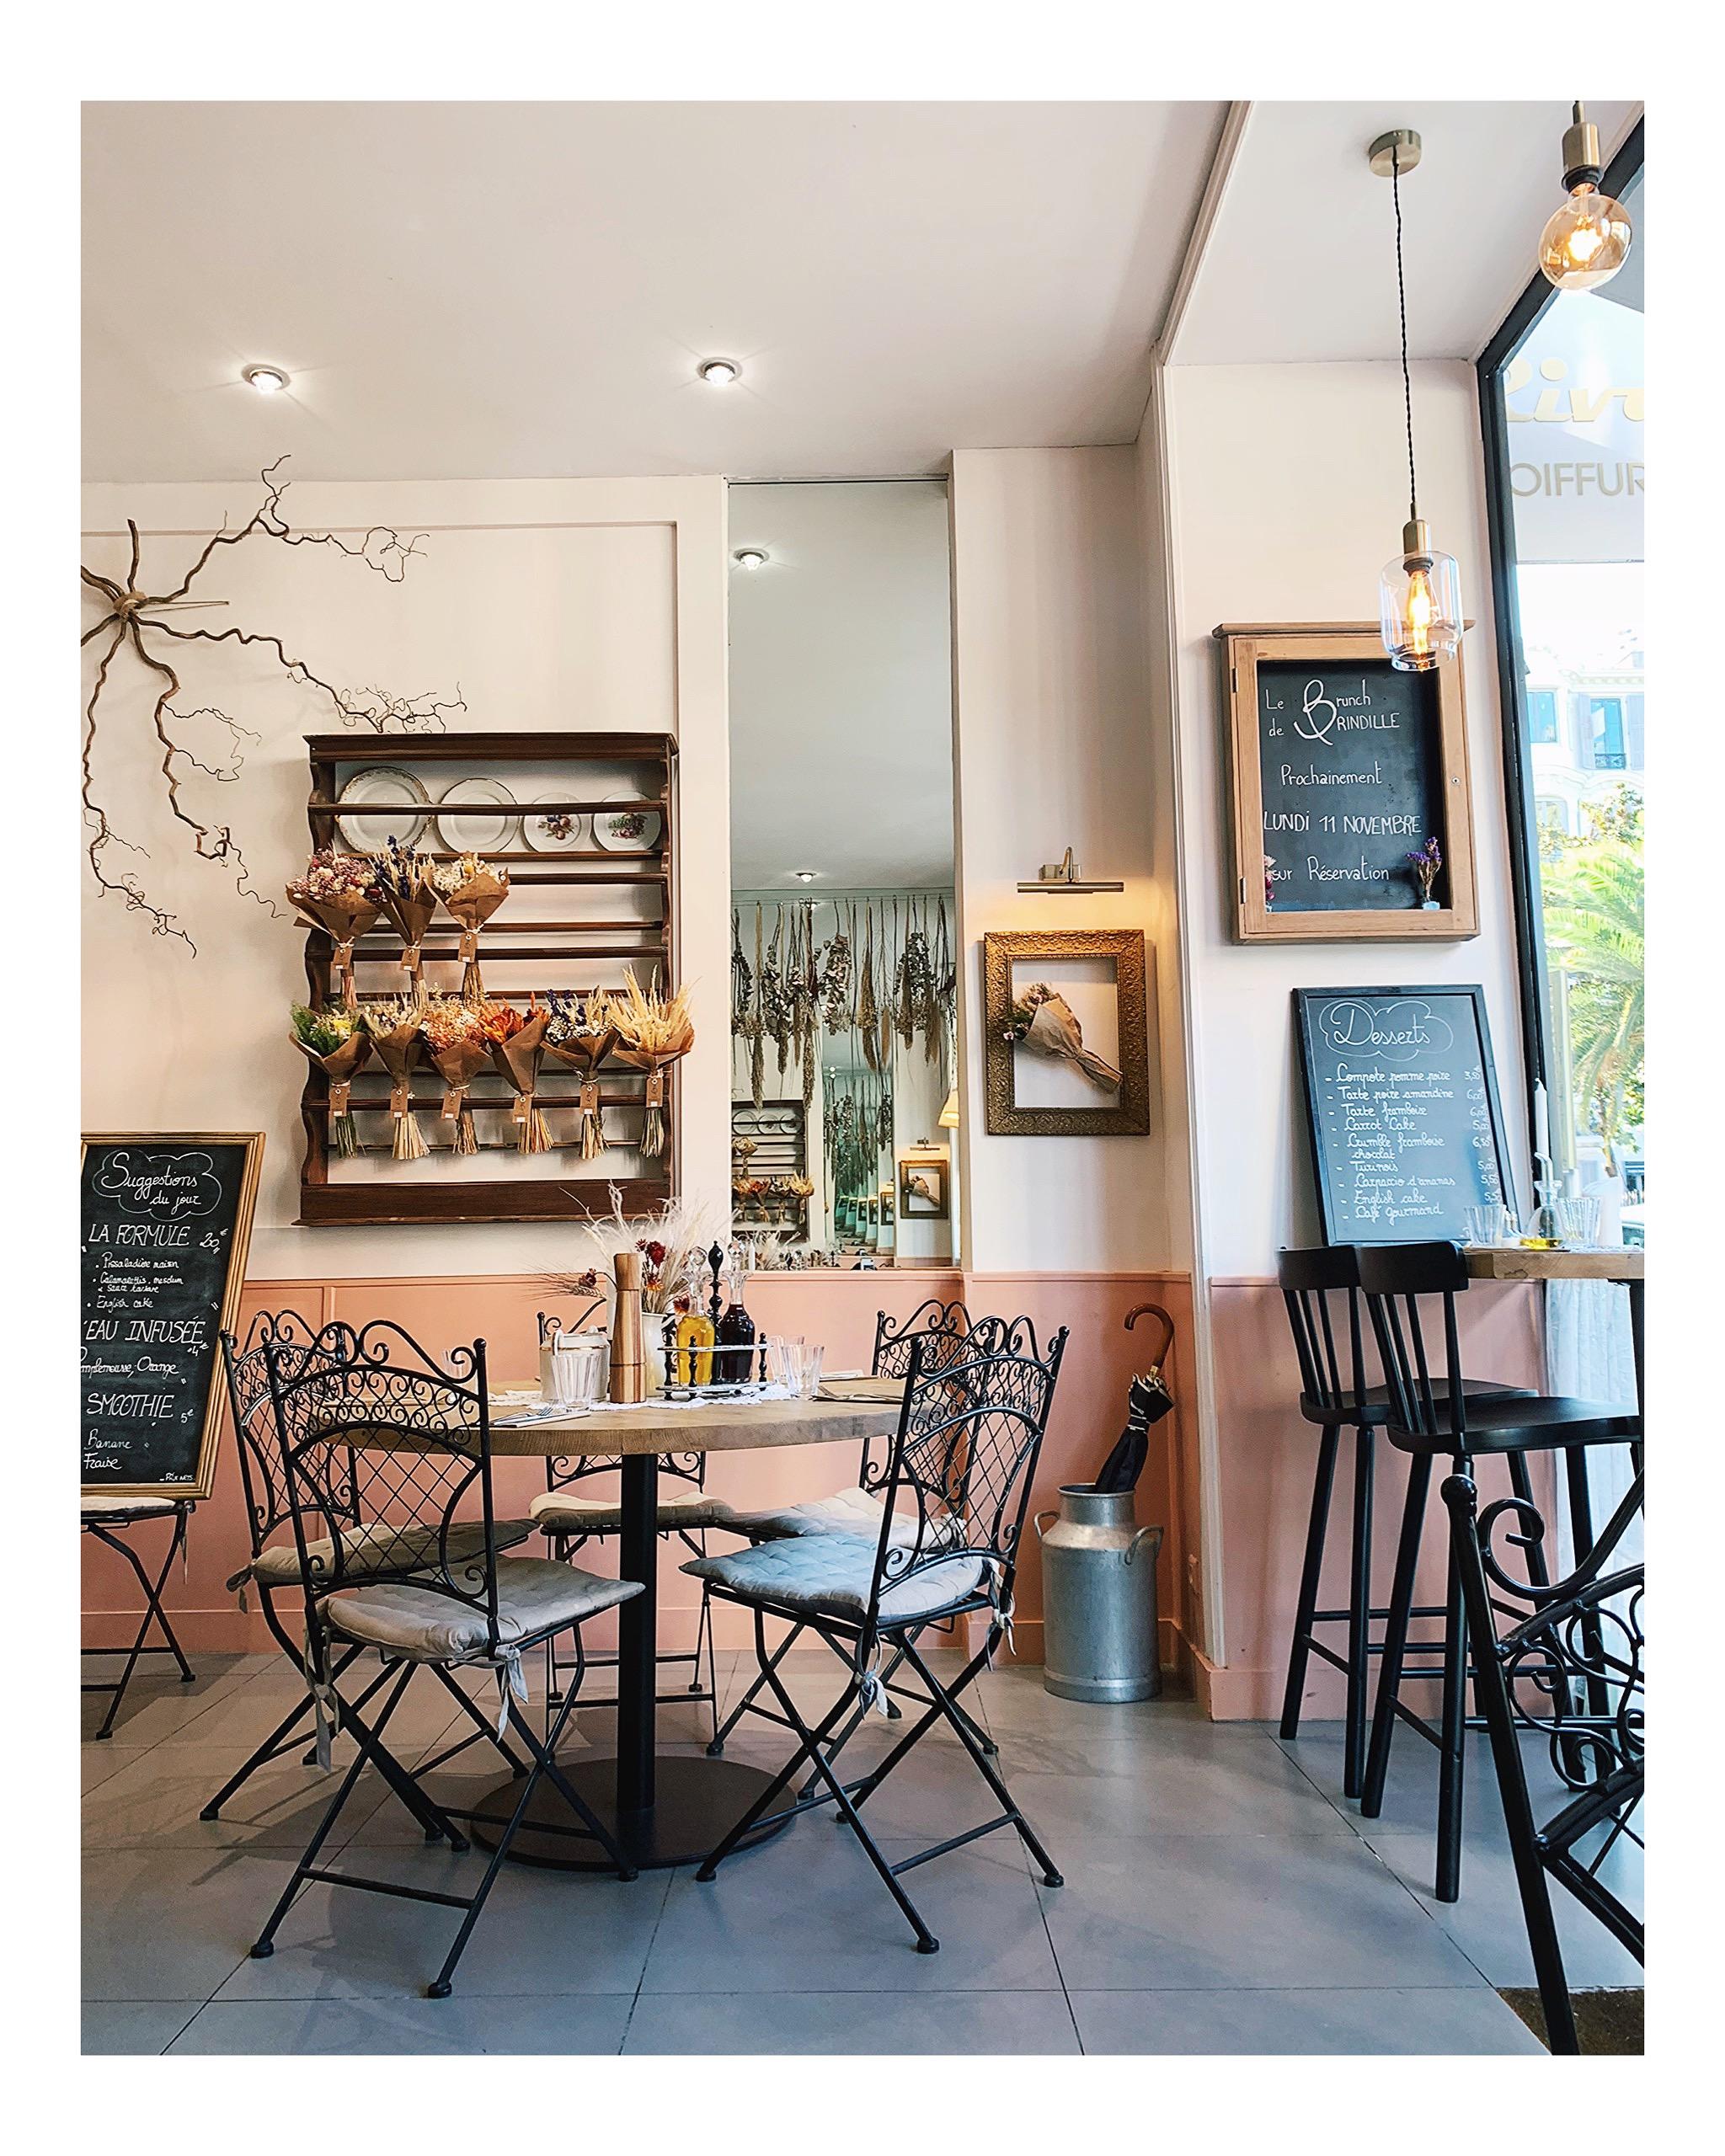 Café_BRINDILLE_Restaurant_Nice